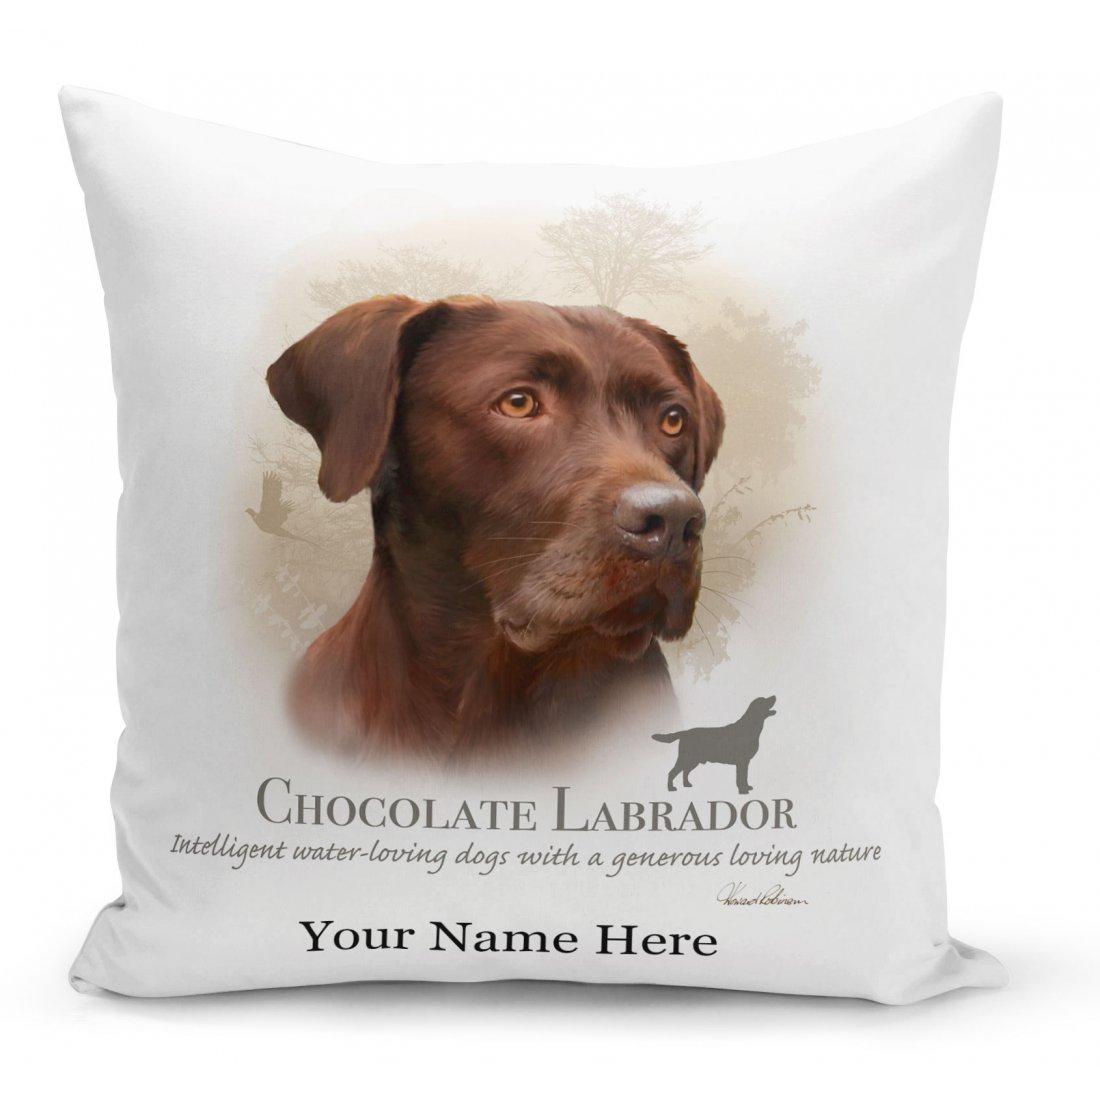 Chocolate Labrador Dog Cushion